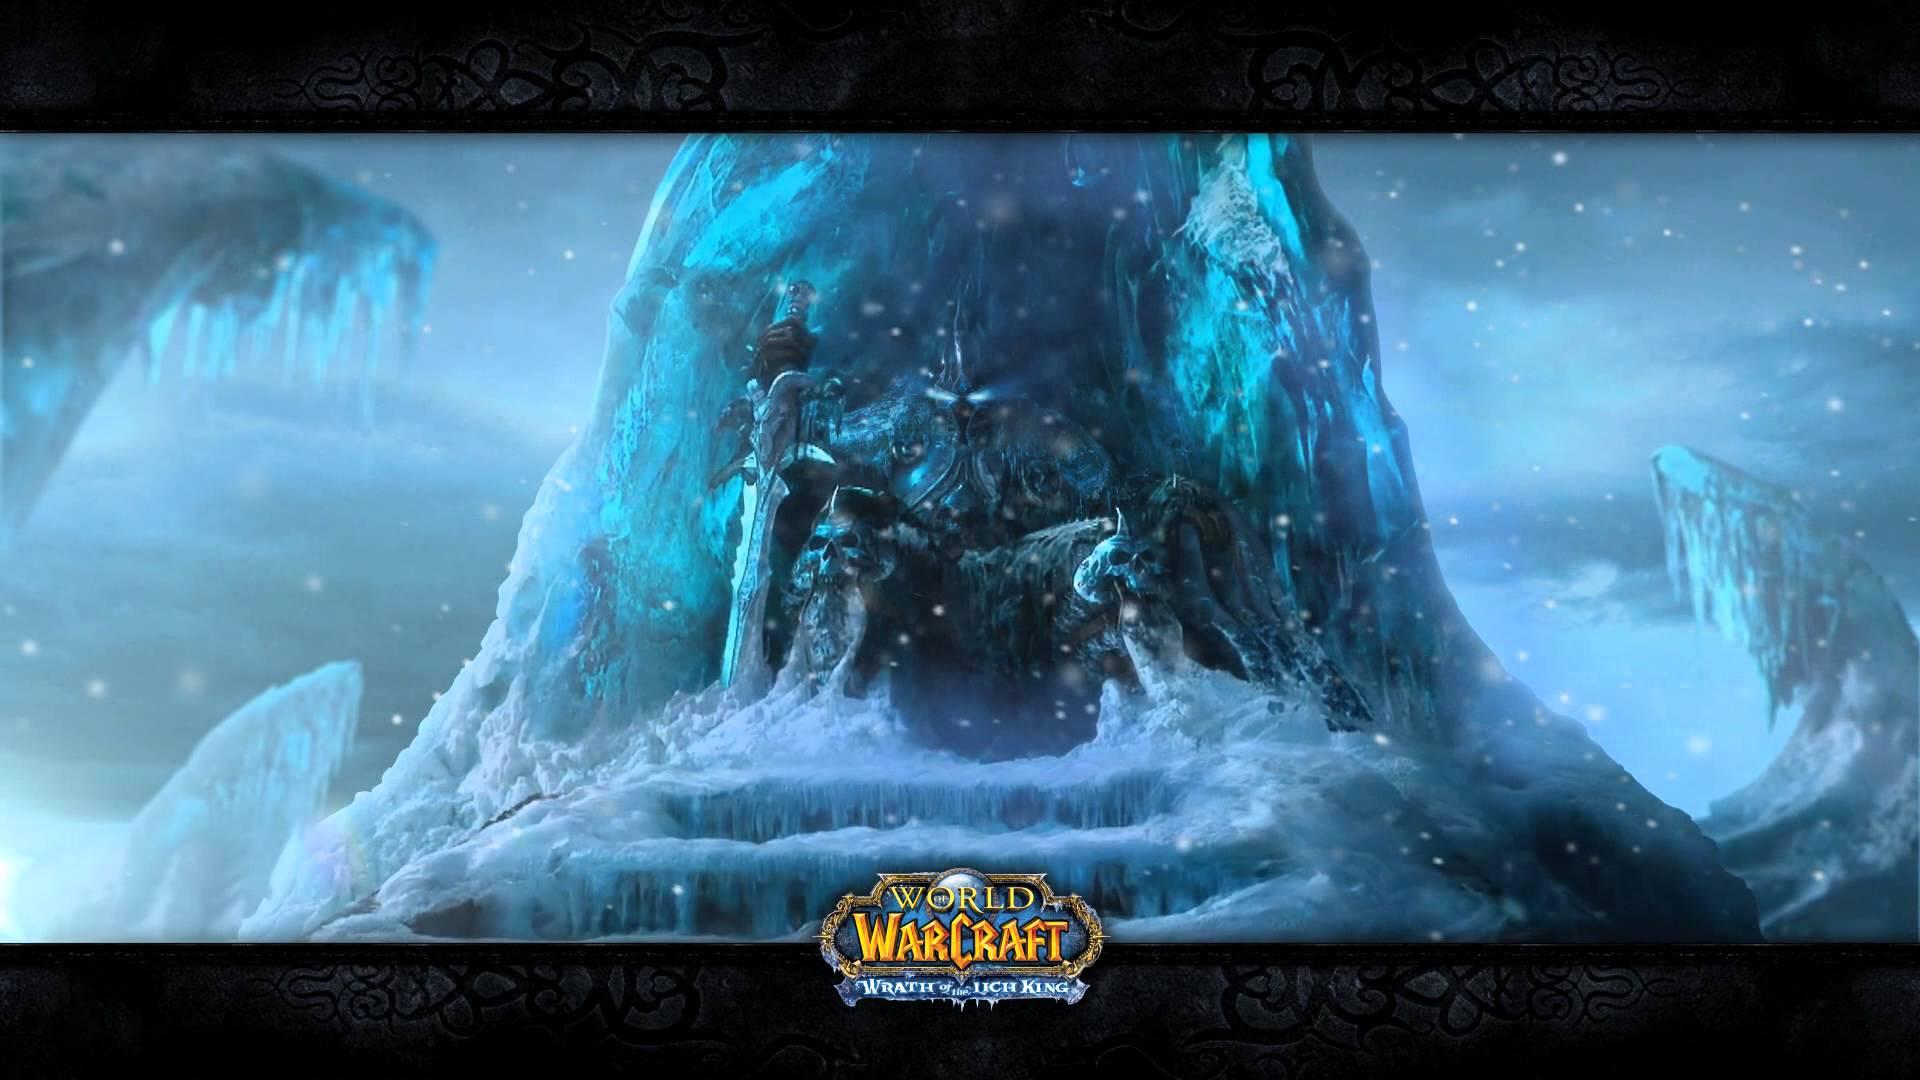 46 World Of Warcraft Animated Wallpaper On Wallpapersafari